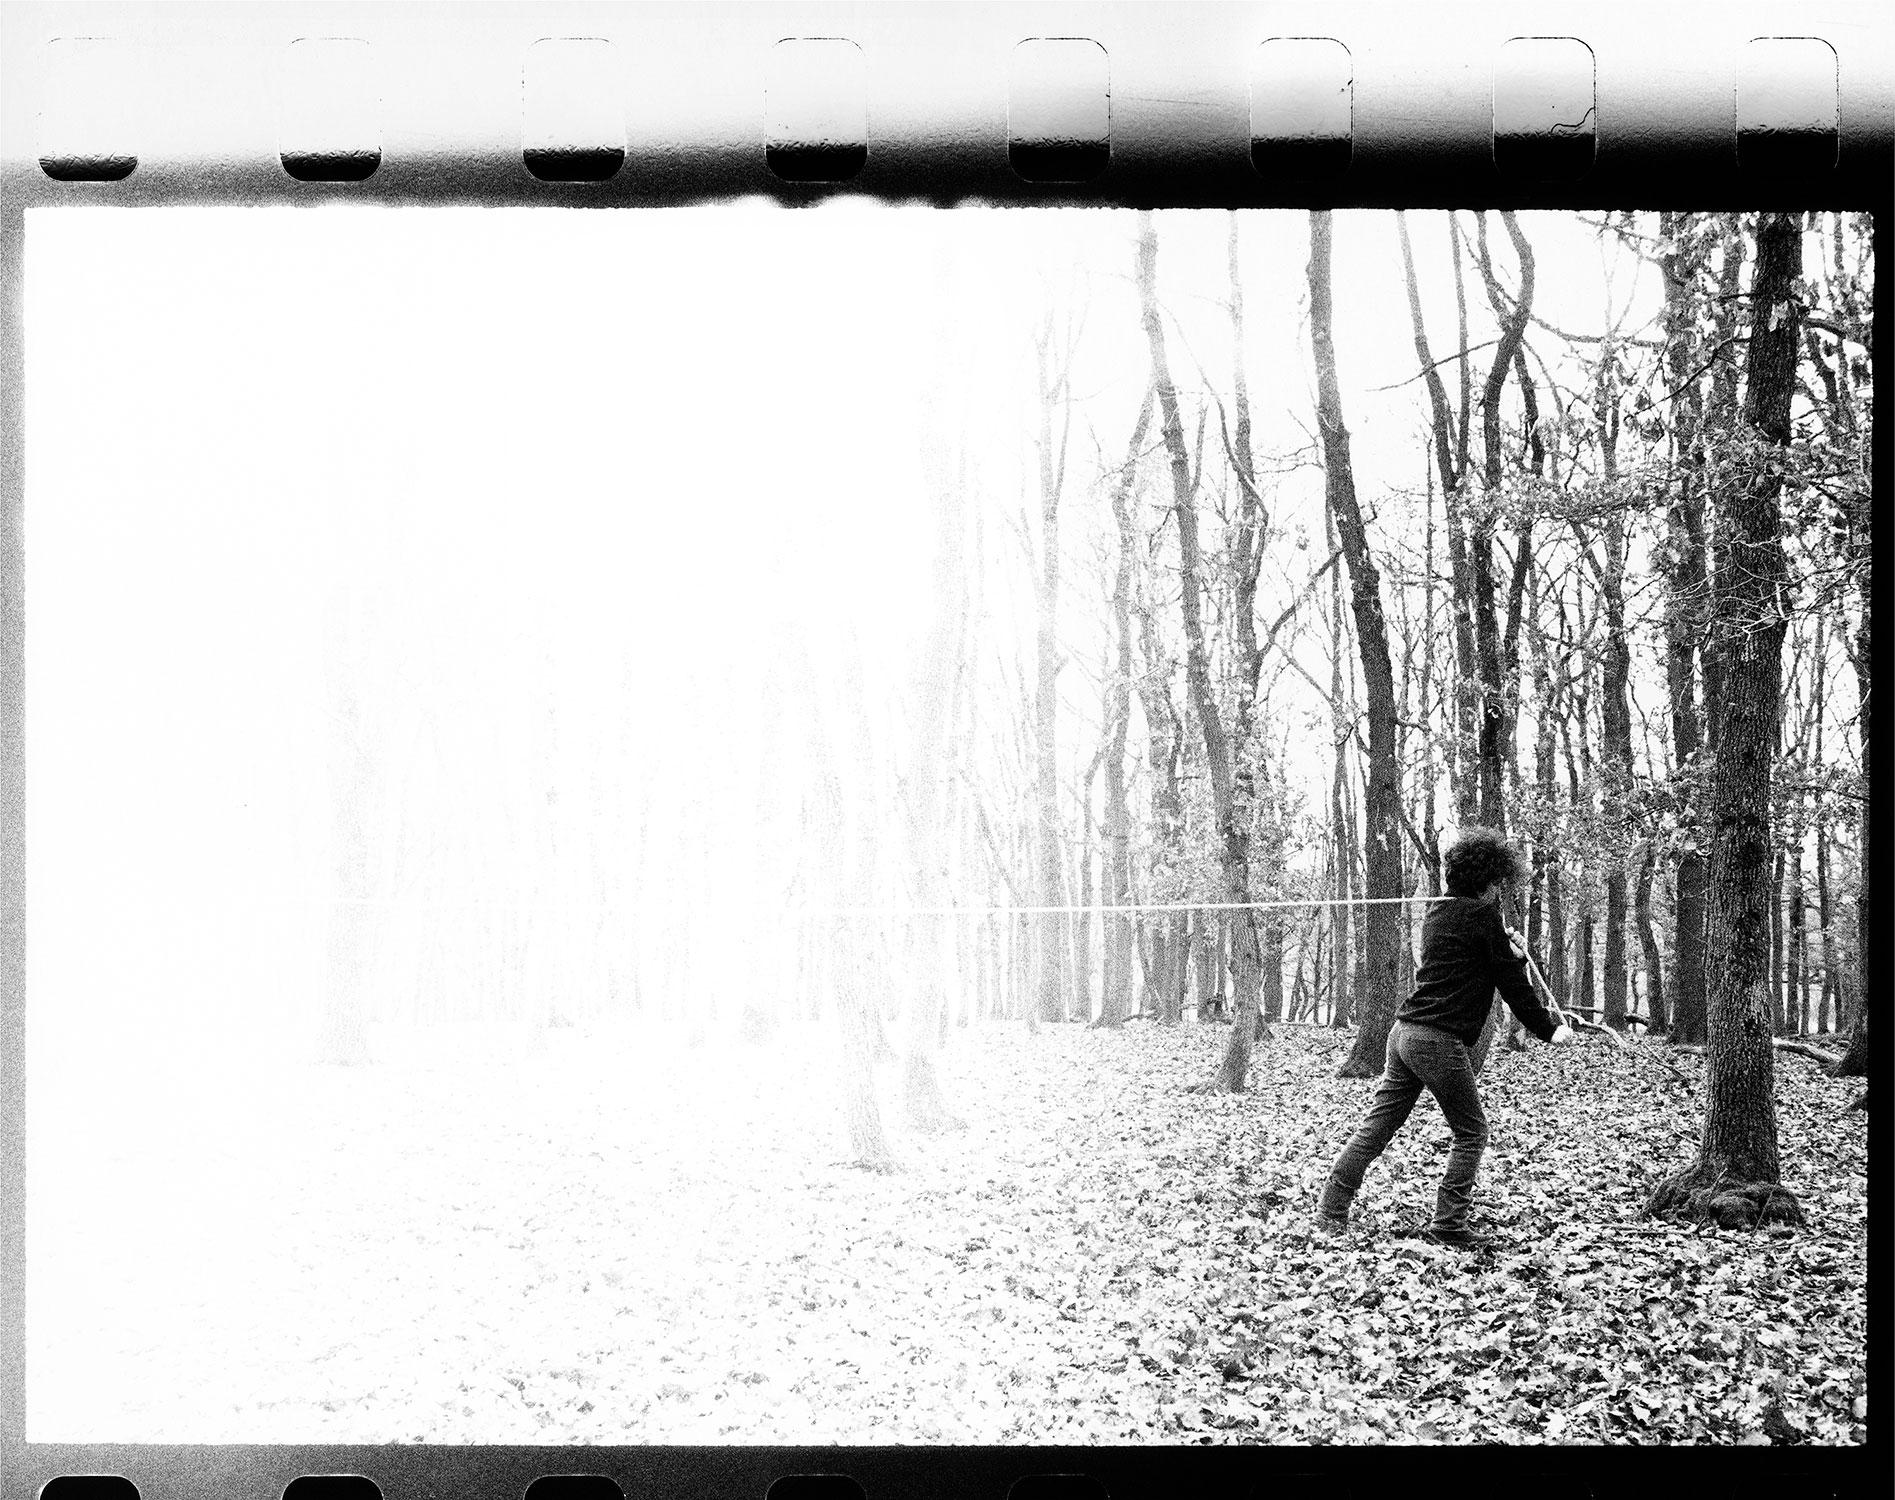 Mouna Karray, The Rope 3/4